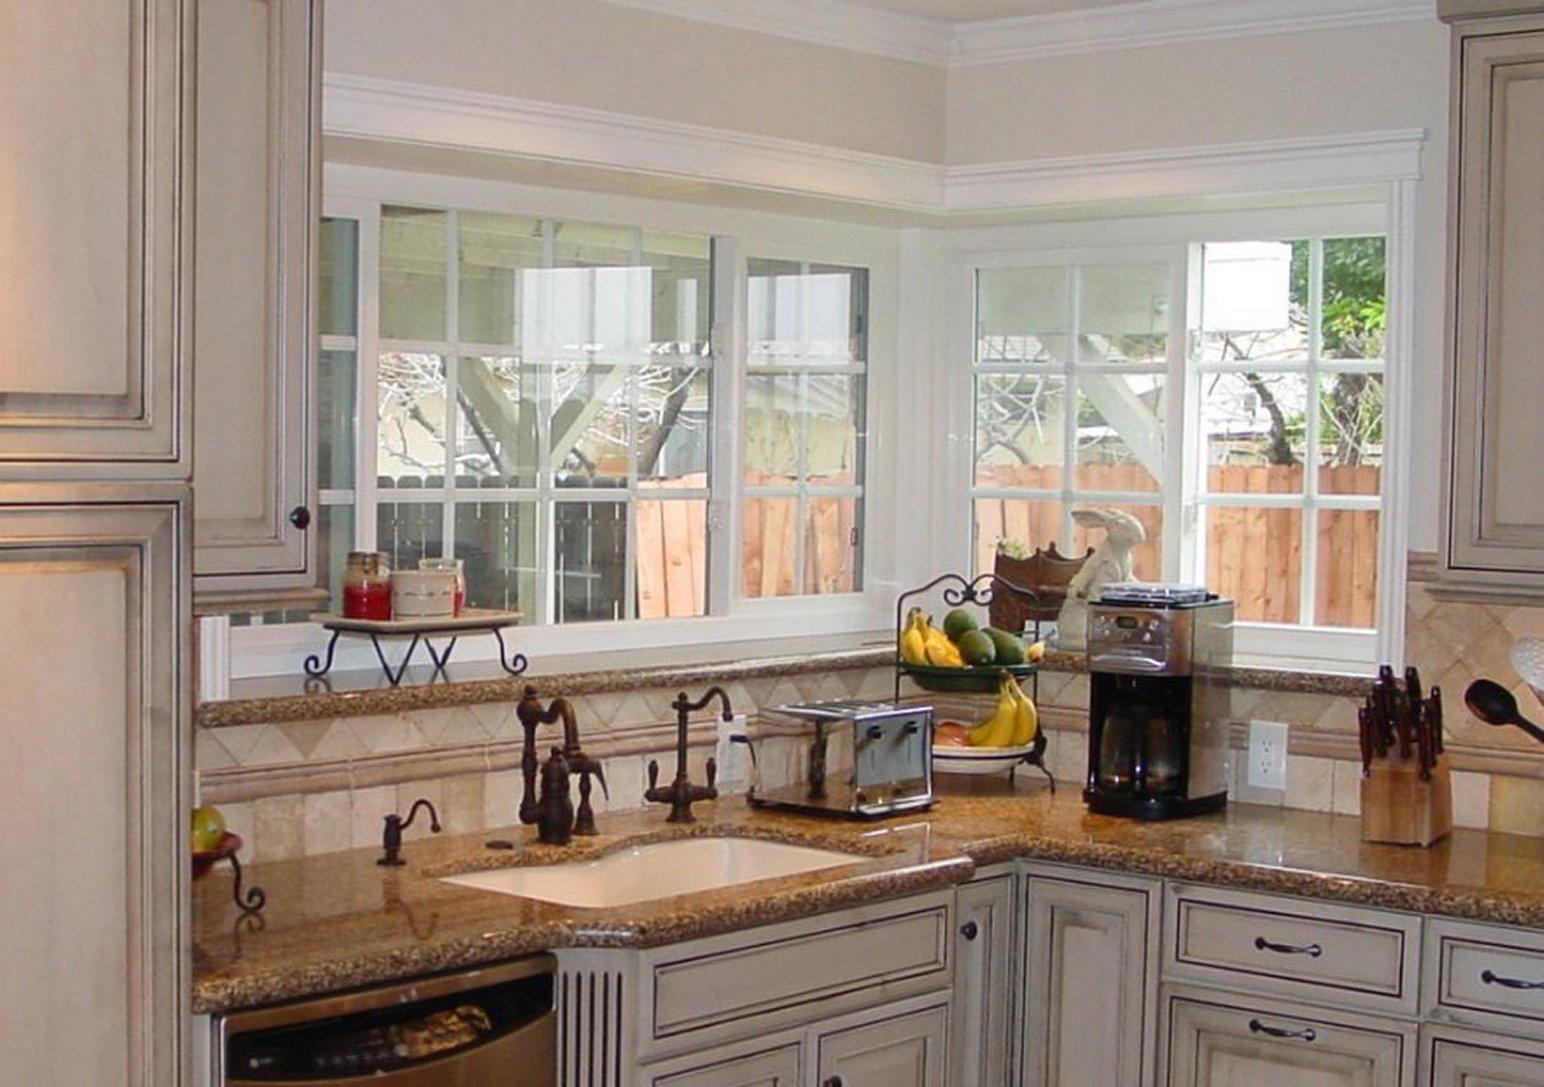 Window kitchen Photo - 4